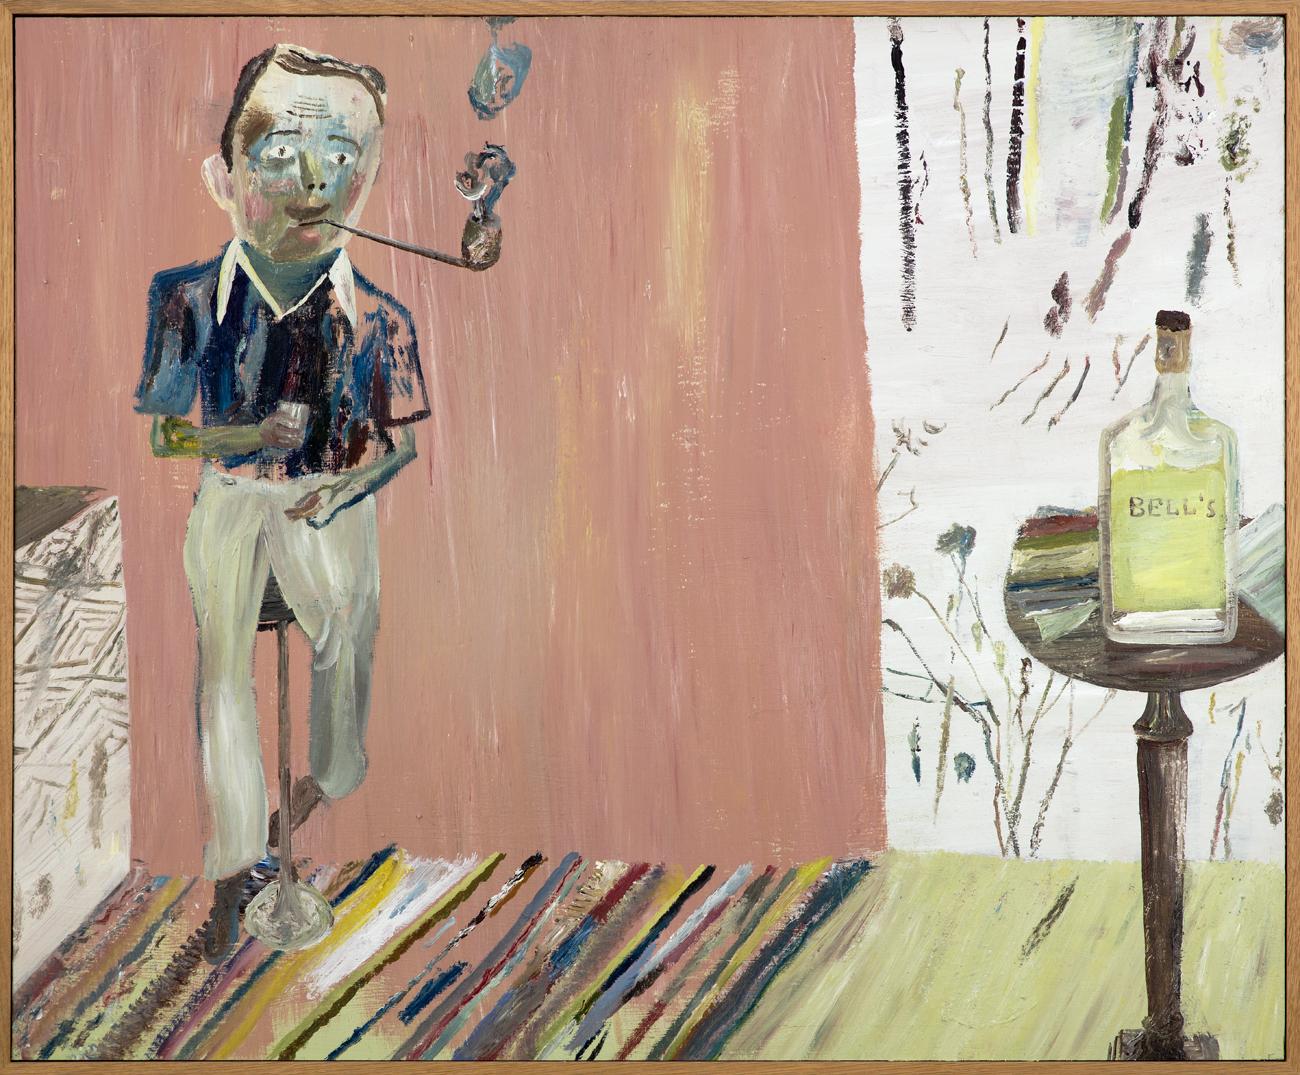 Jockum Nordström  Piprökaren  1998 Oil on panel 79 x 77 cm